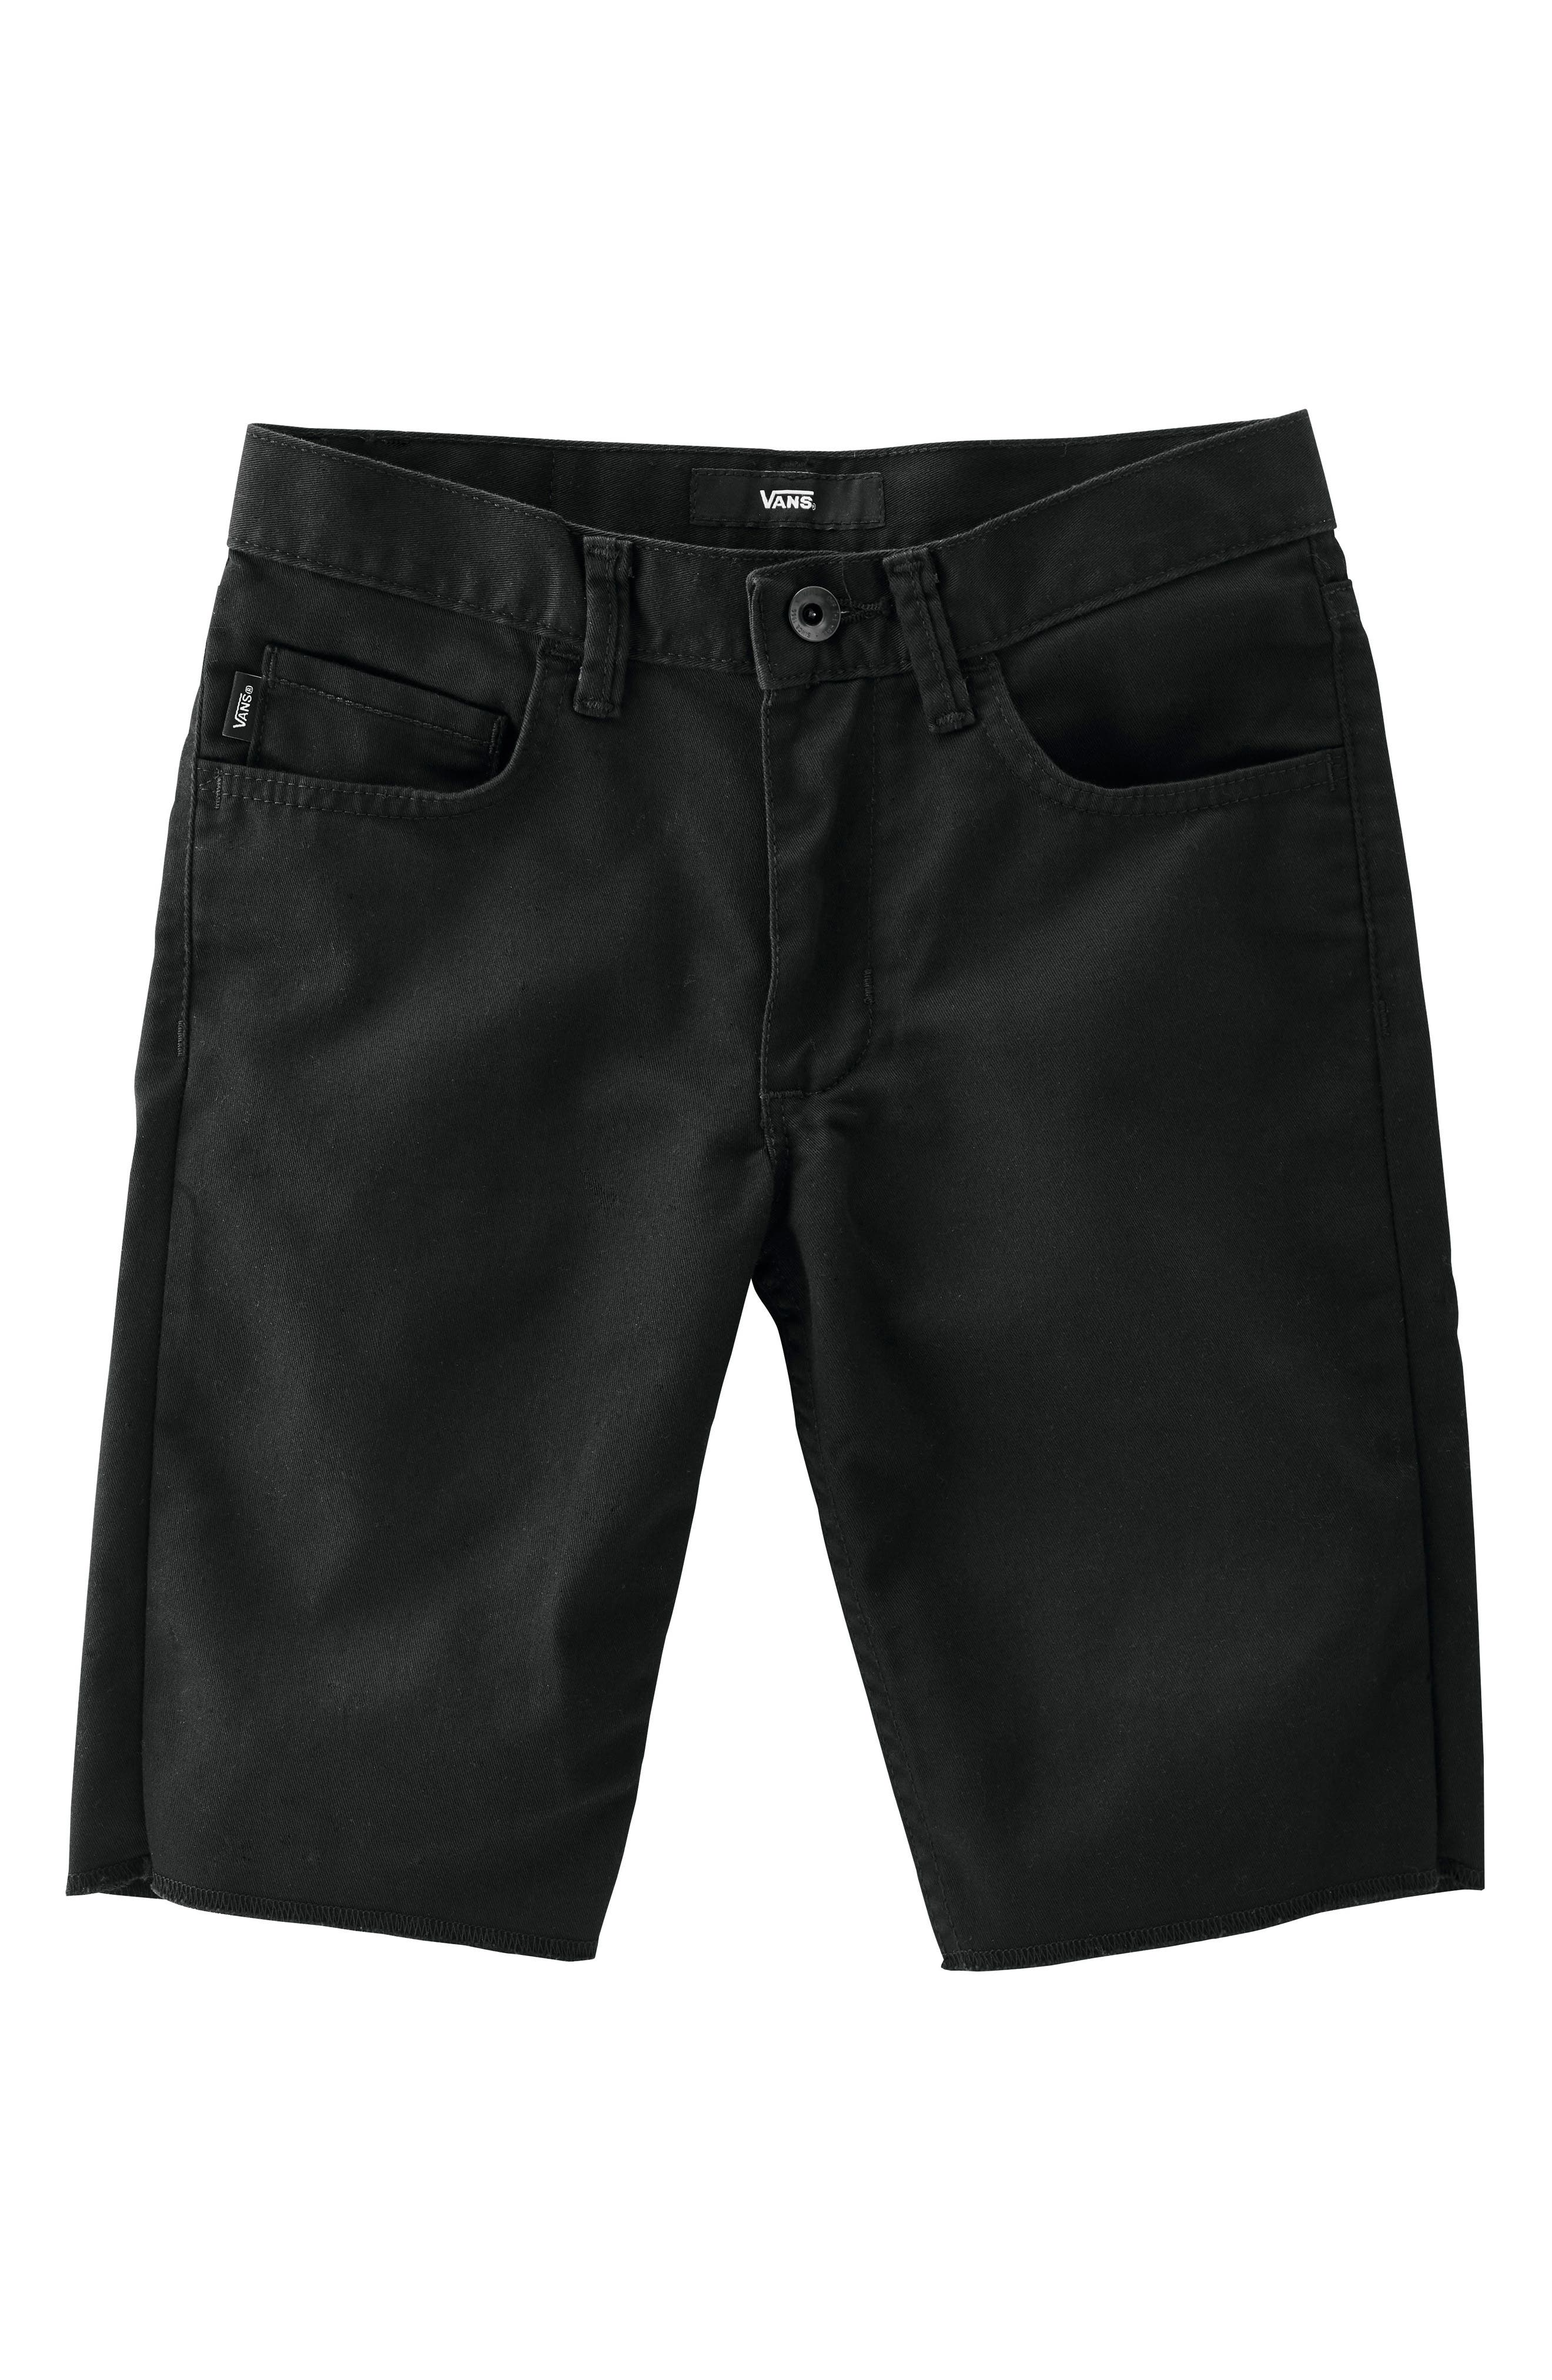 Covina II - Anthony Van Engelen Twill Shorts,                         Main,                         color, 001